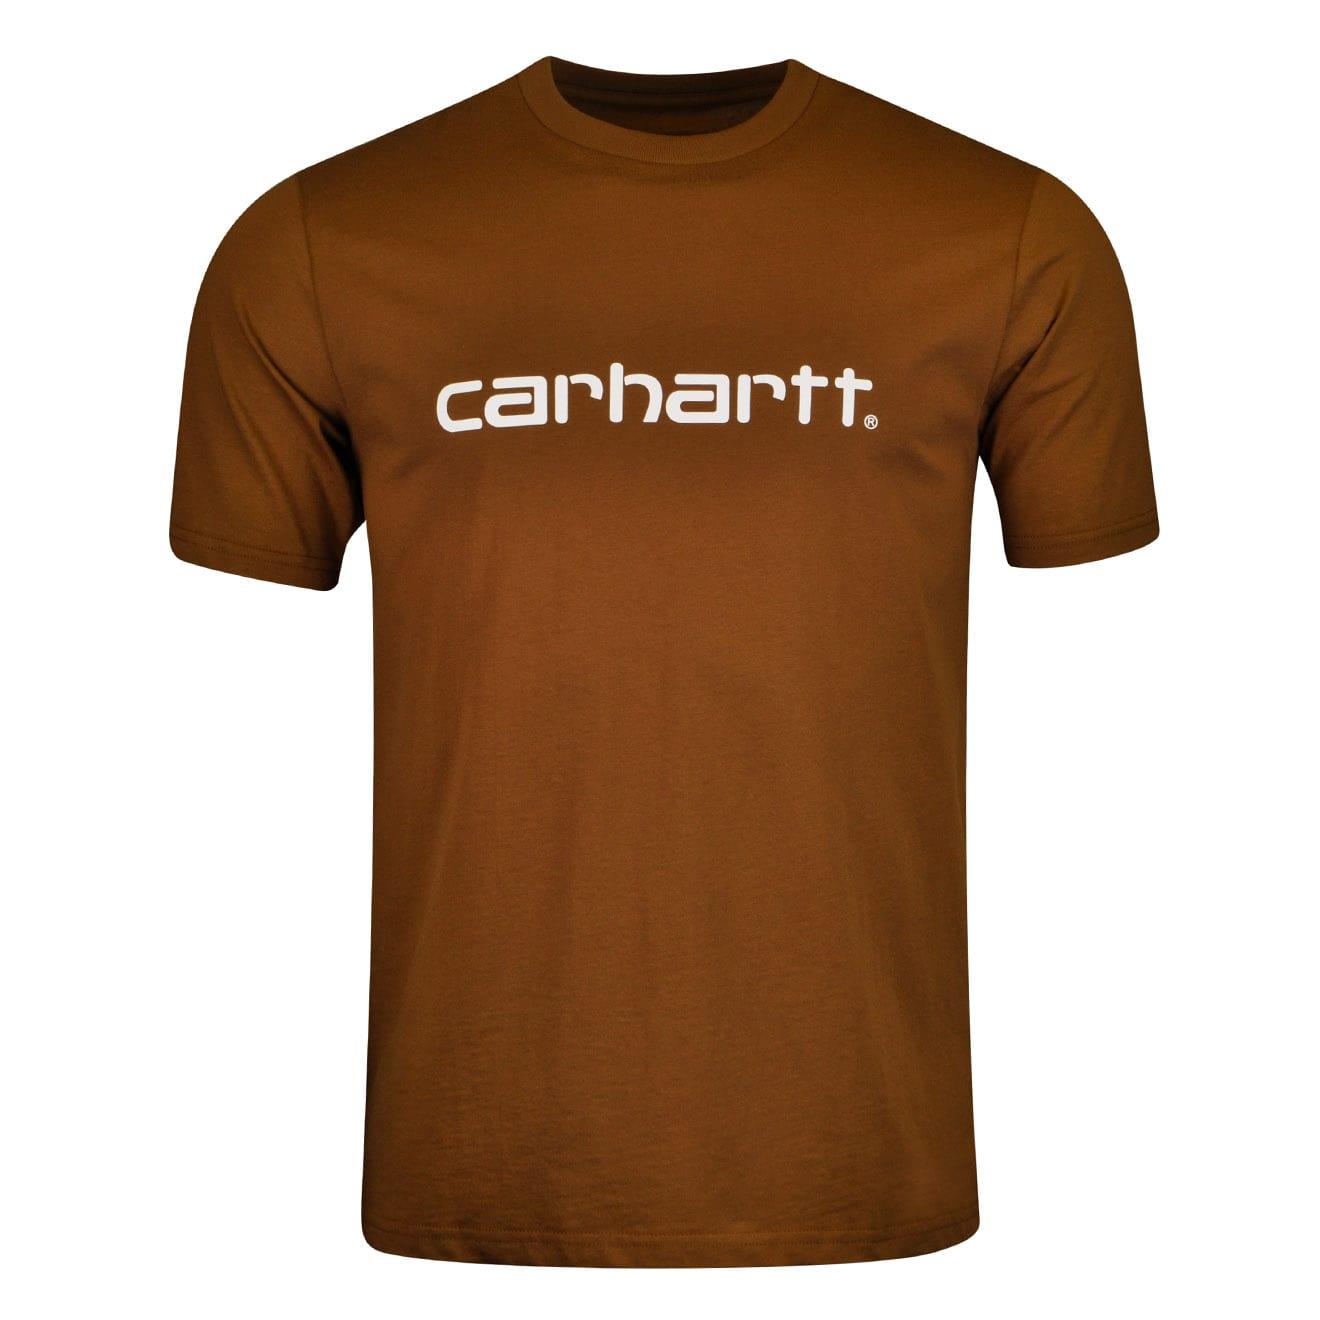 carhartt script t shirt the sporting lodge. Black Bedroom Furniture Sets. Home Design Ideas